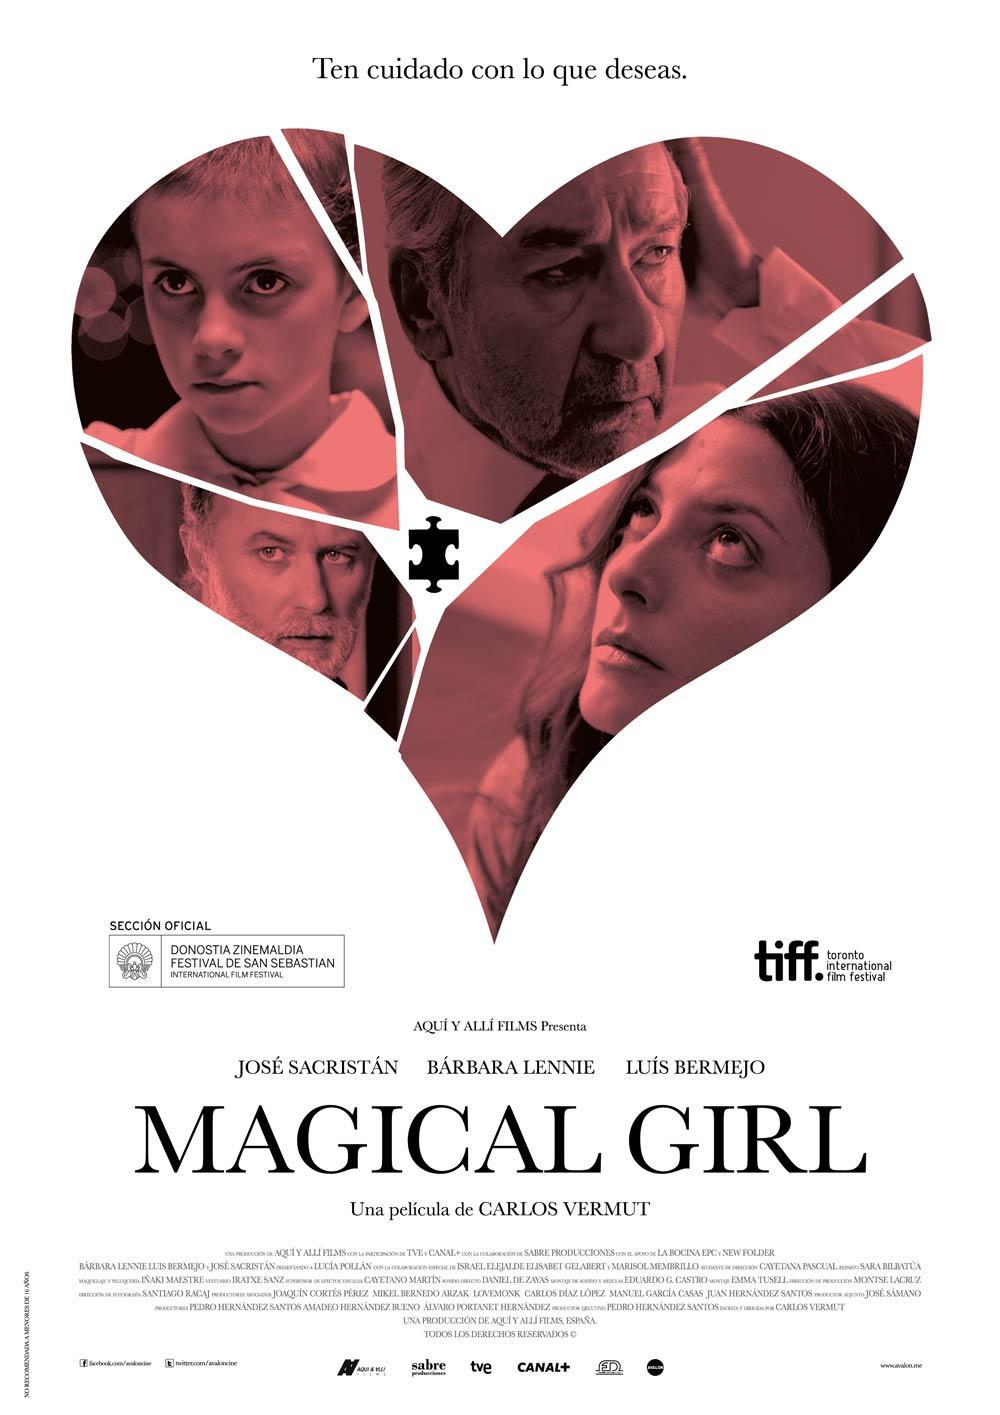 Magical girl 2014 imdb